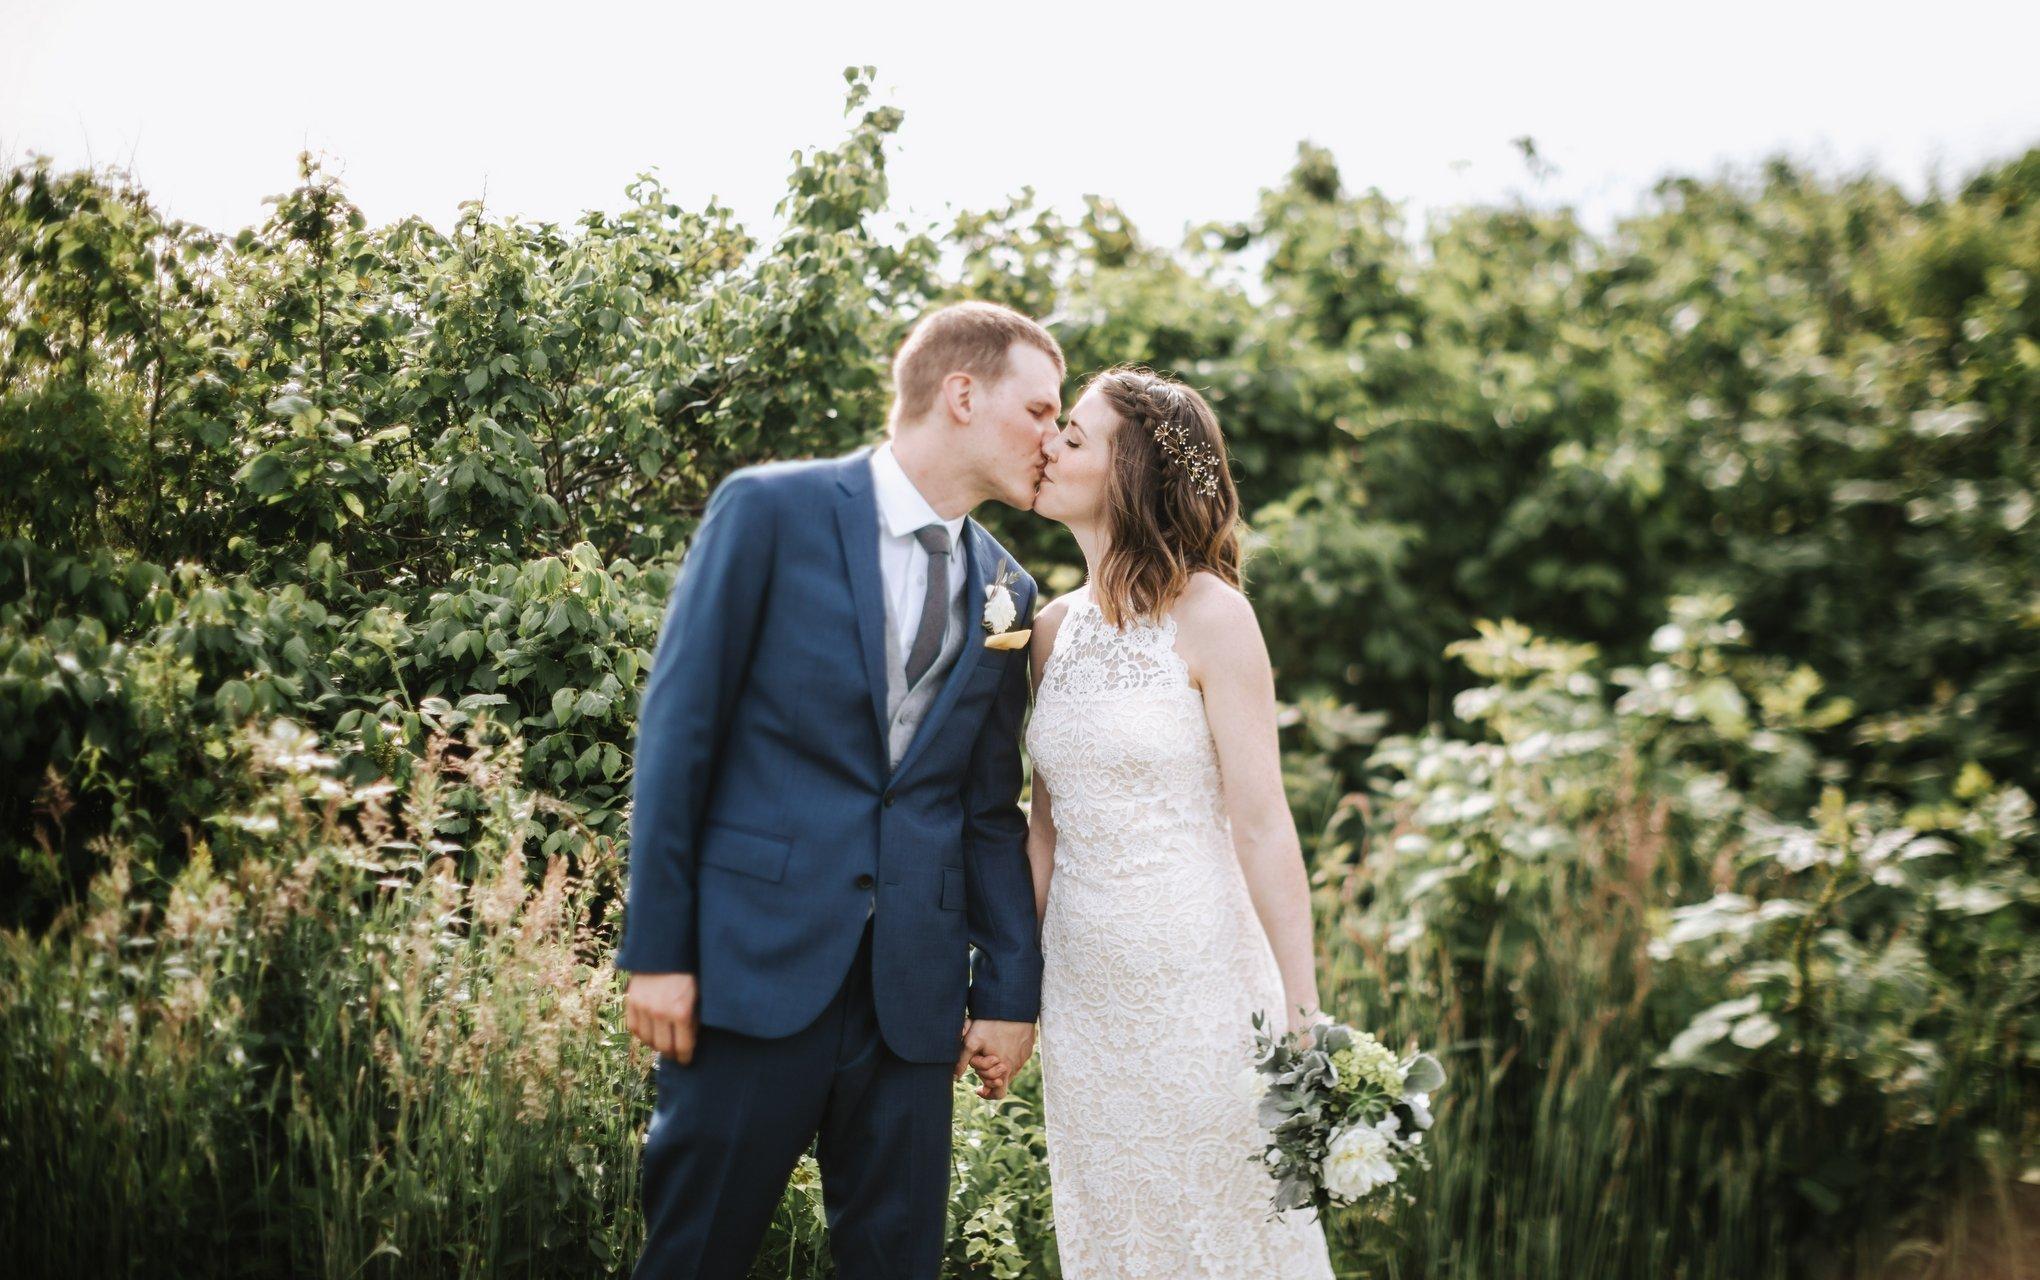 Eisenhower-House-Photographer-Newport-Wedding-20.jpg